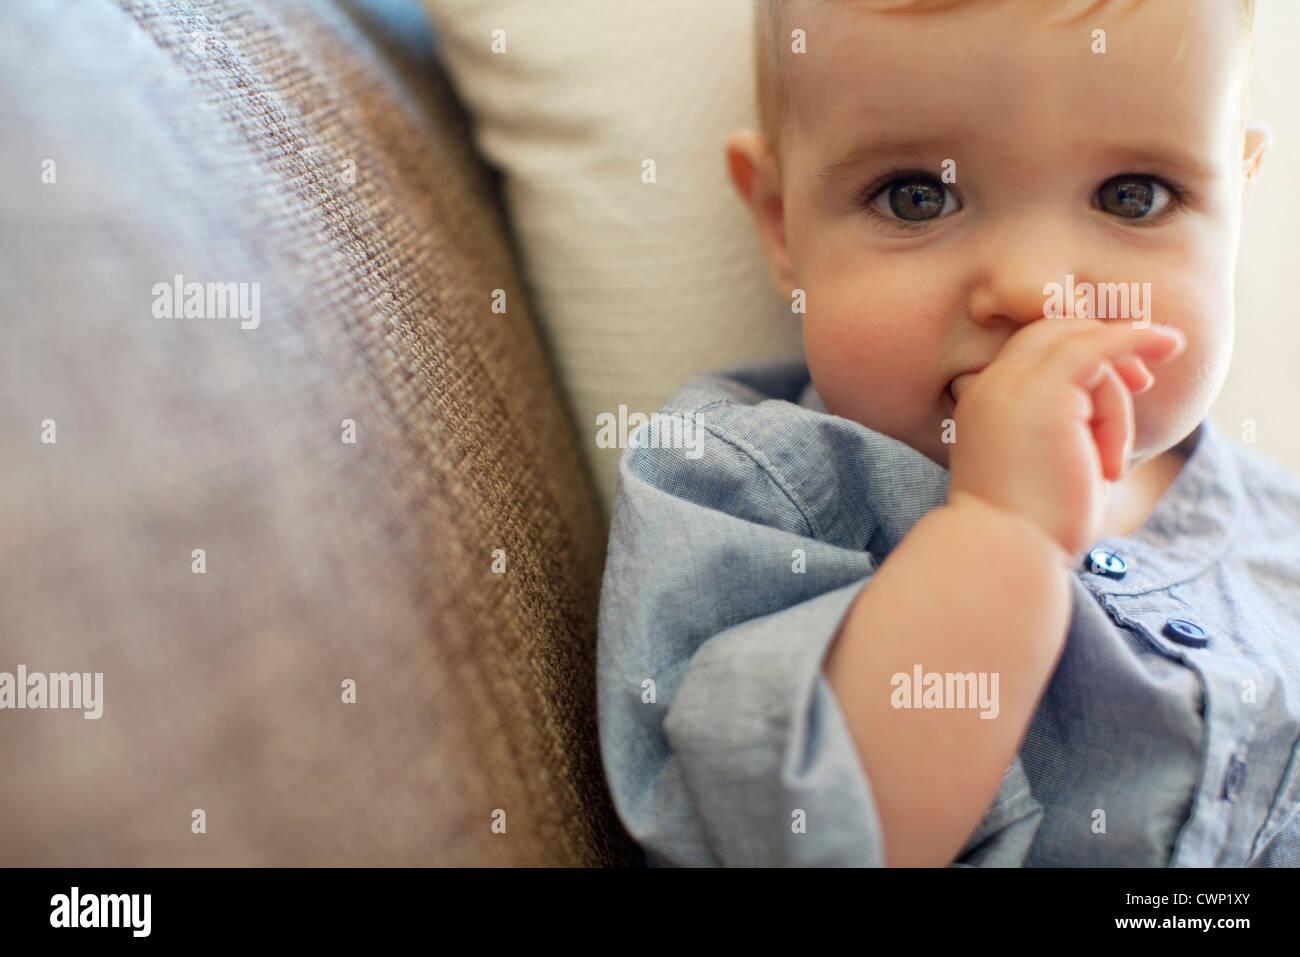 Baby Boy, portrait Photo Stock